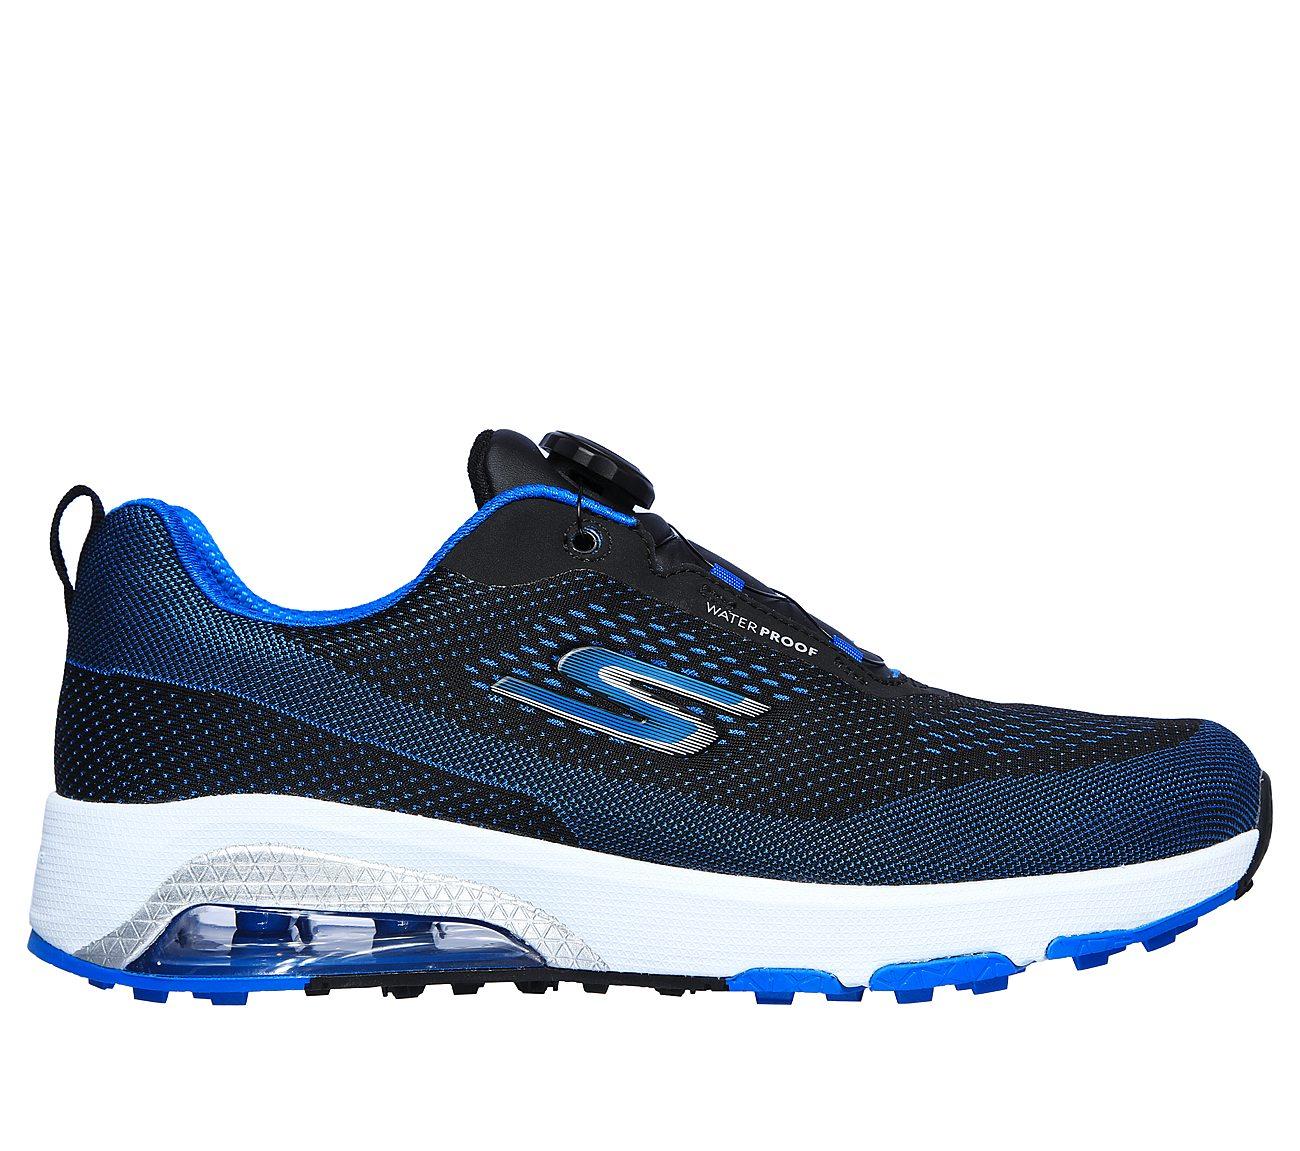 Buy SKECHERS Skechers GO GOLF Skech Air Twist Golf Shoes Shoes